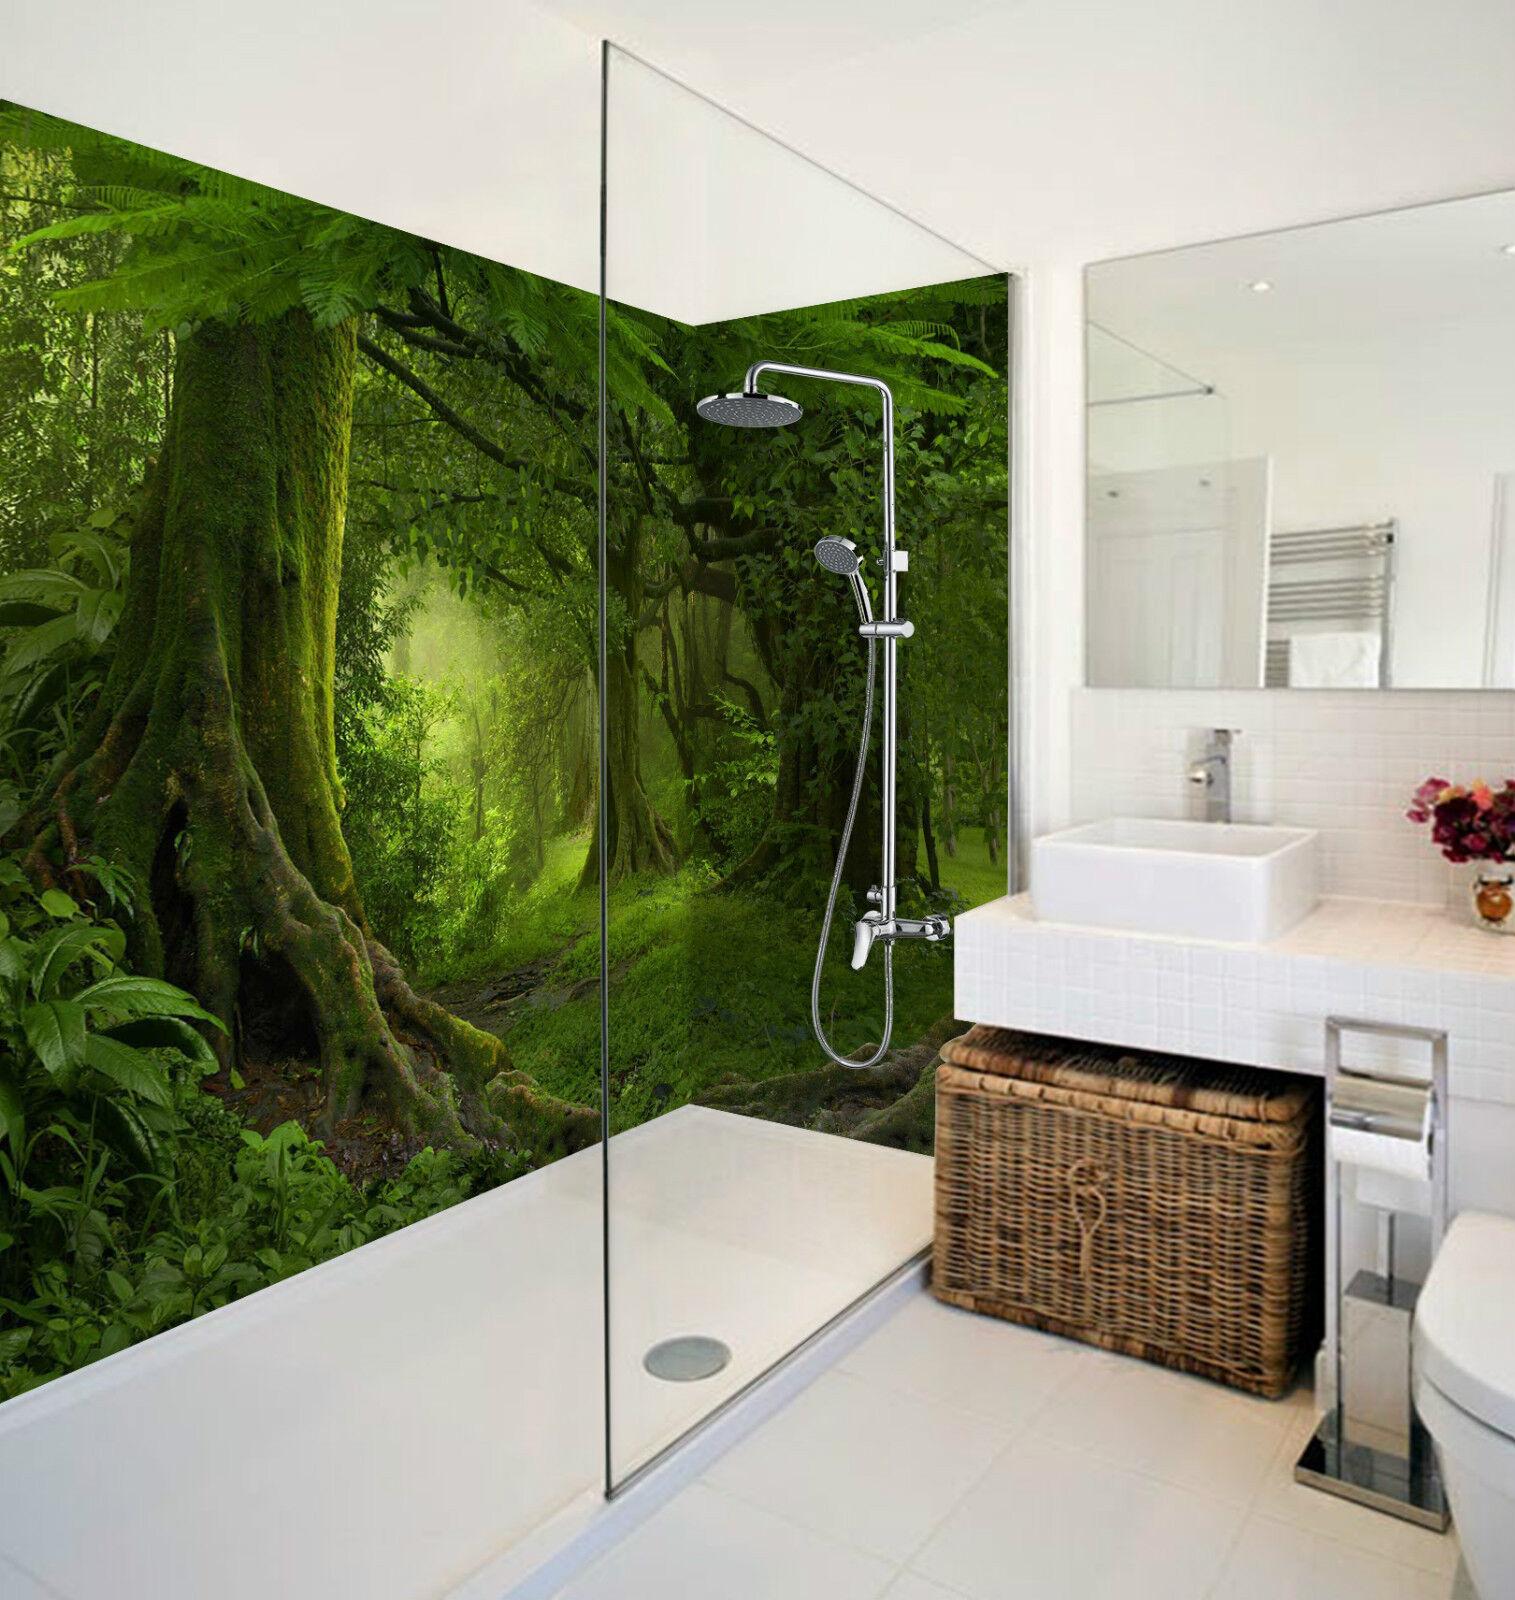 3D Deep Grün Forest 30 WallPaper Bathroom Print Decal Wall Deco AJ WALLPAPER CA